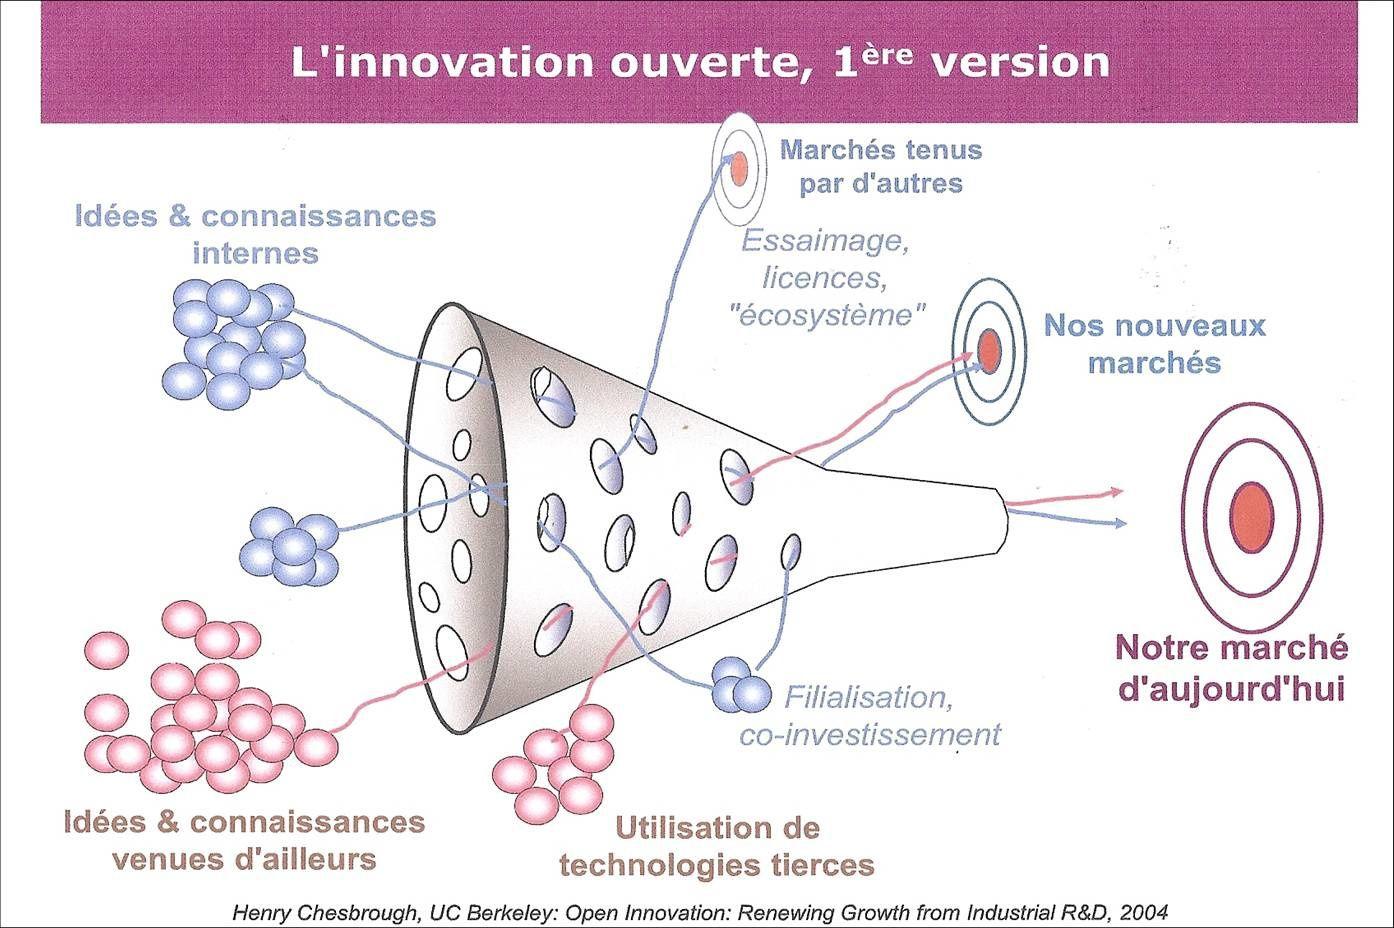 L'innovation ouverte selon O. Ezratty